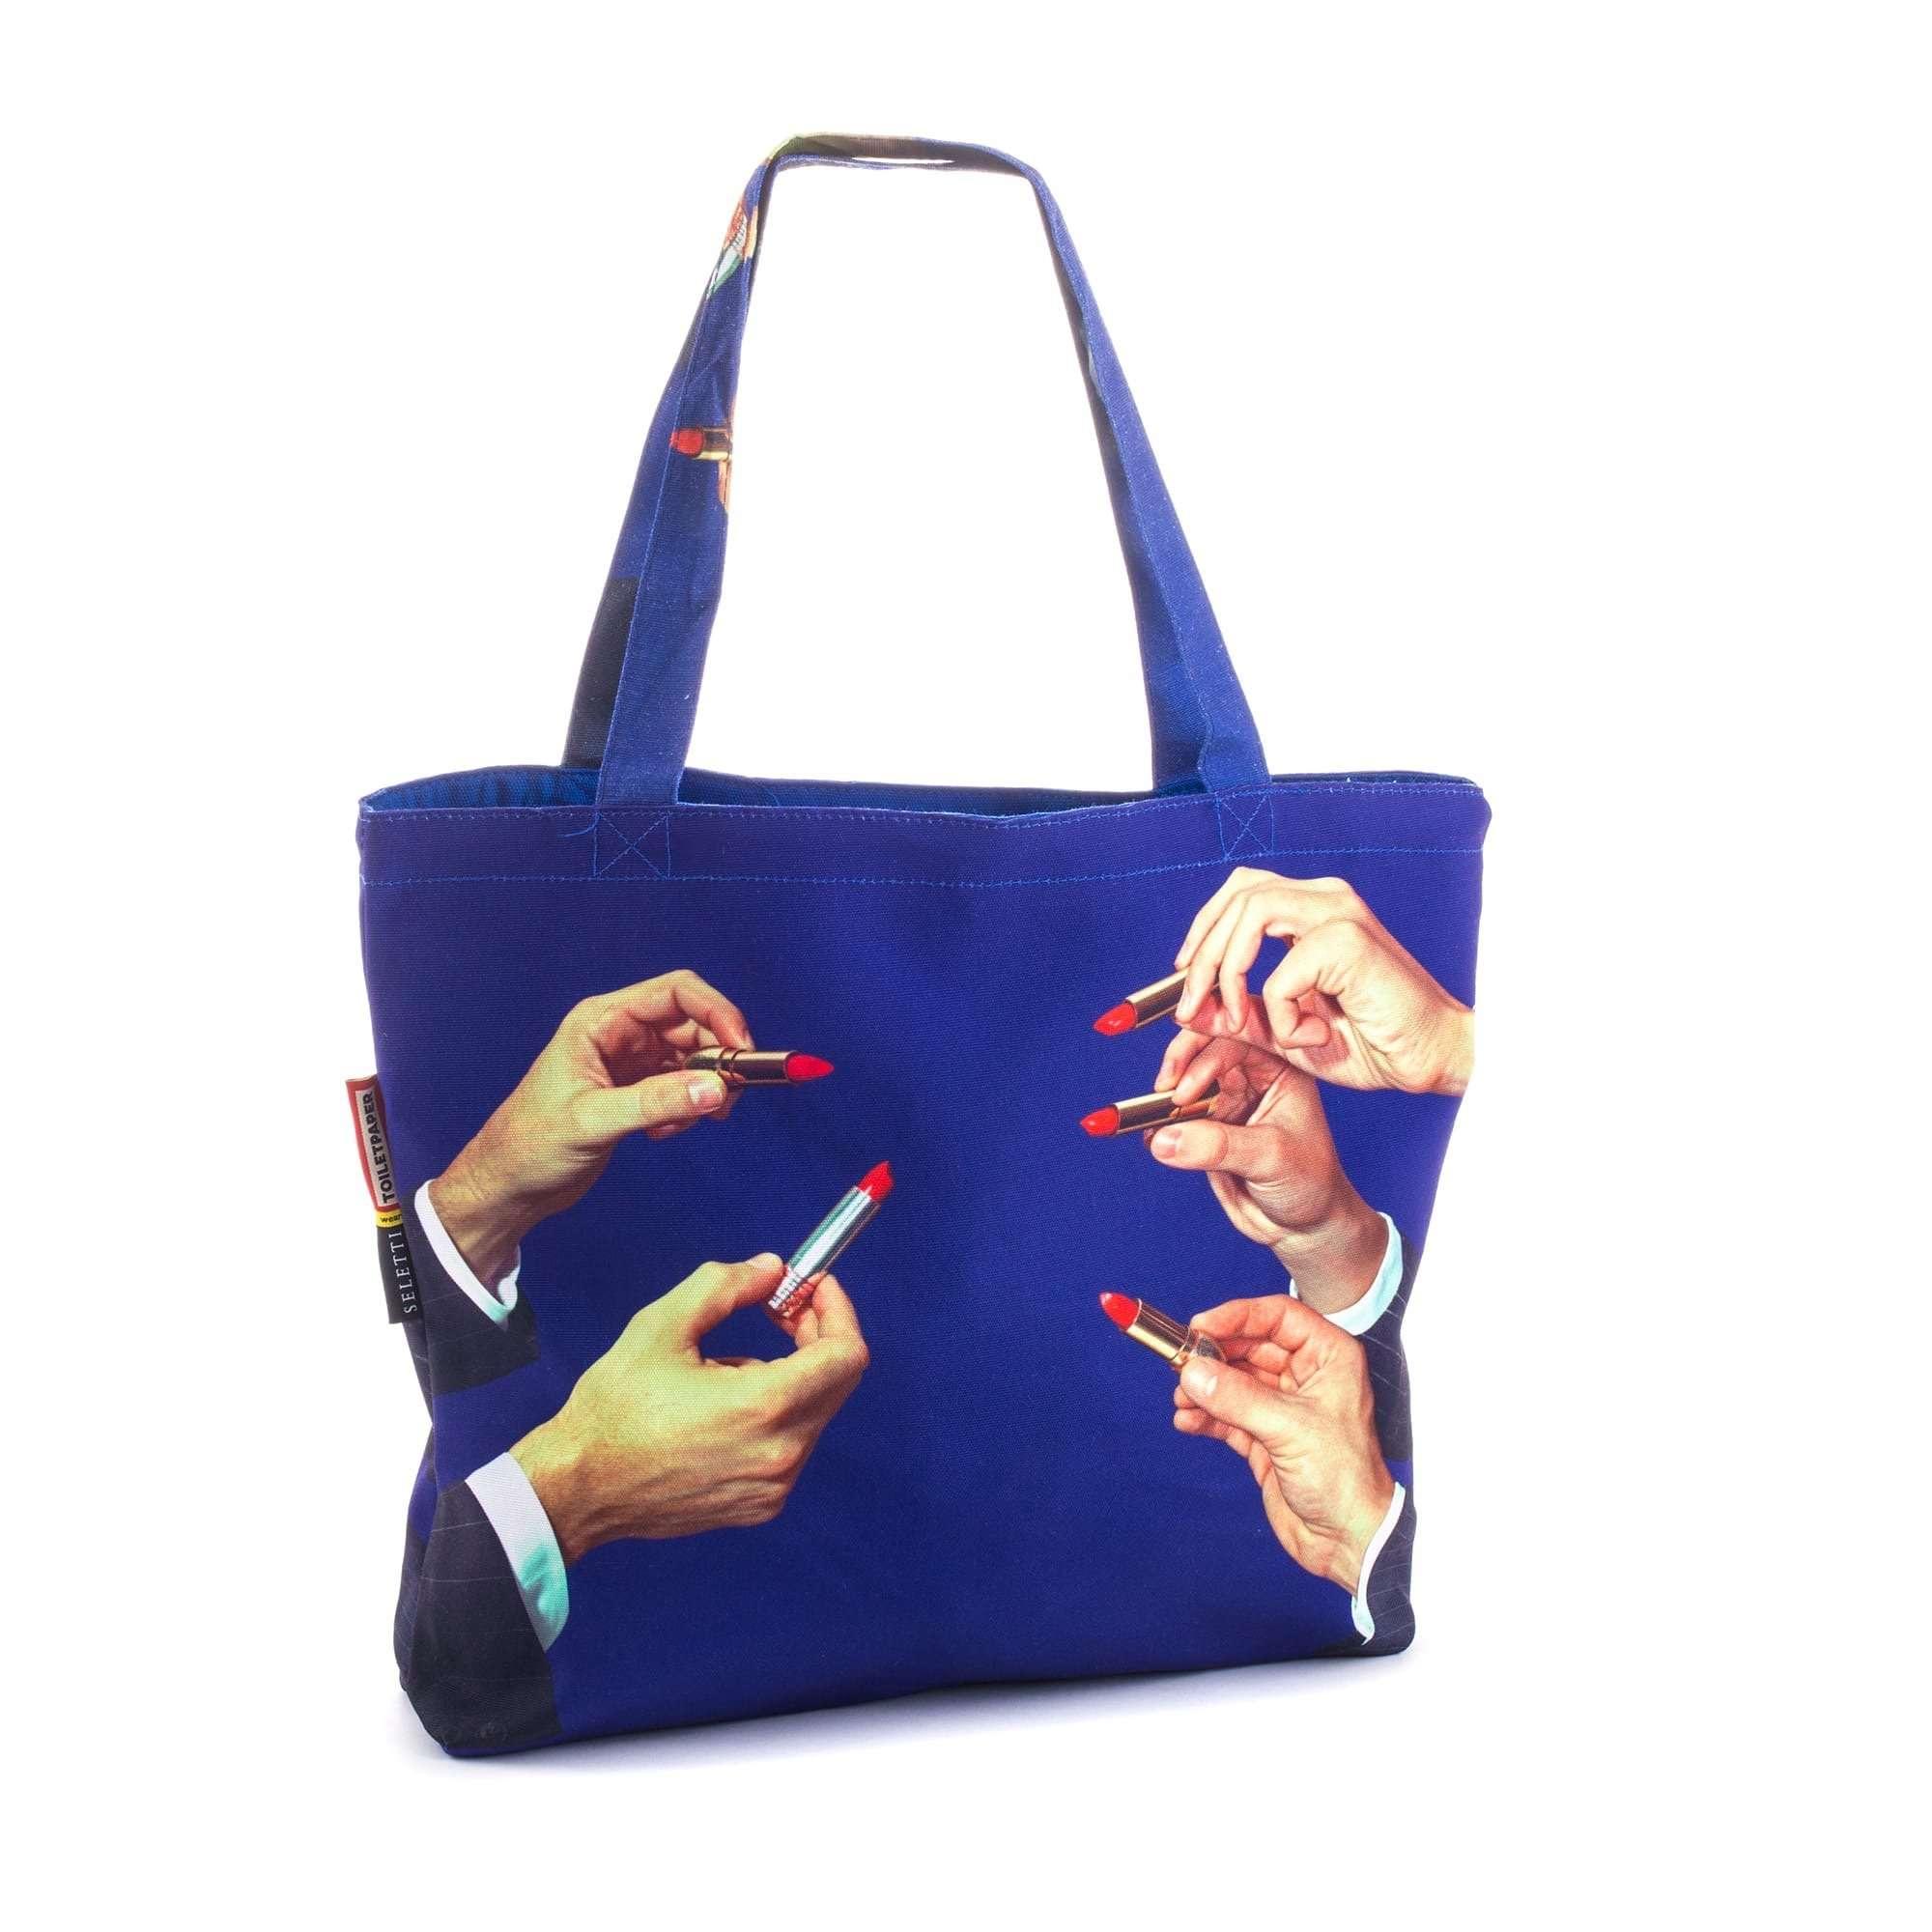 seletti-toilet-paper-borsa-bag-lipstick